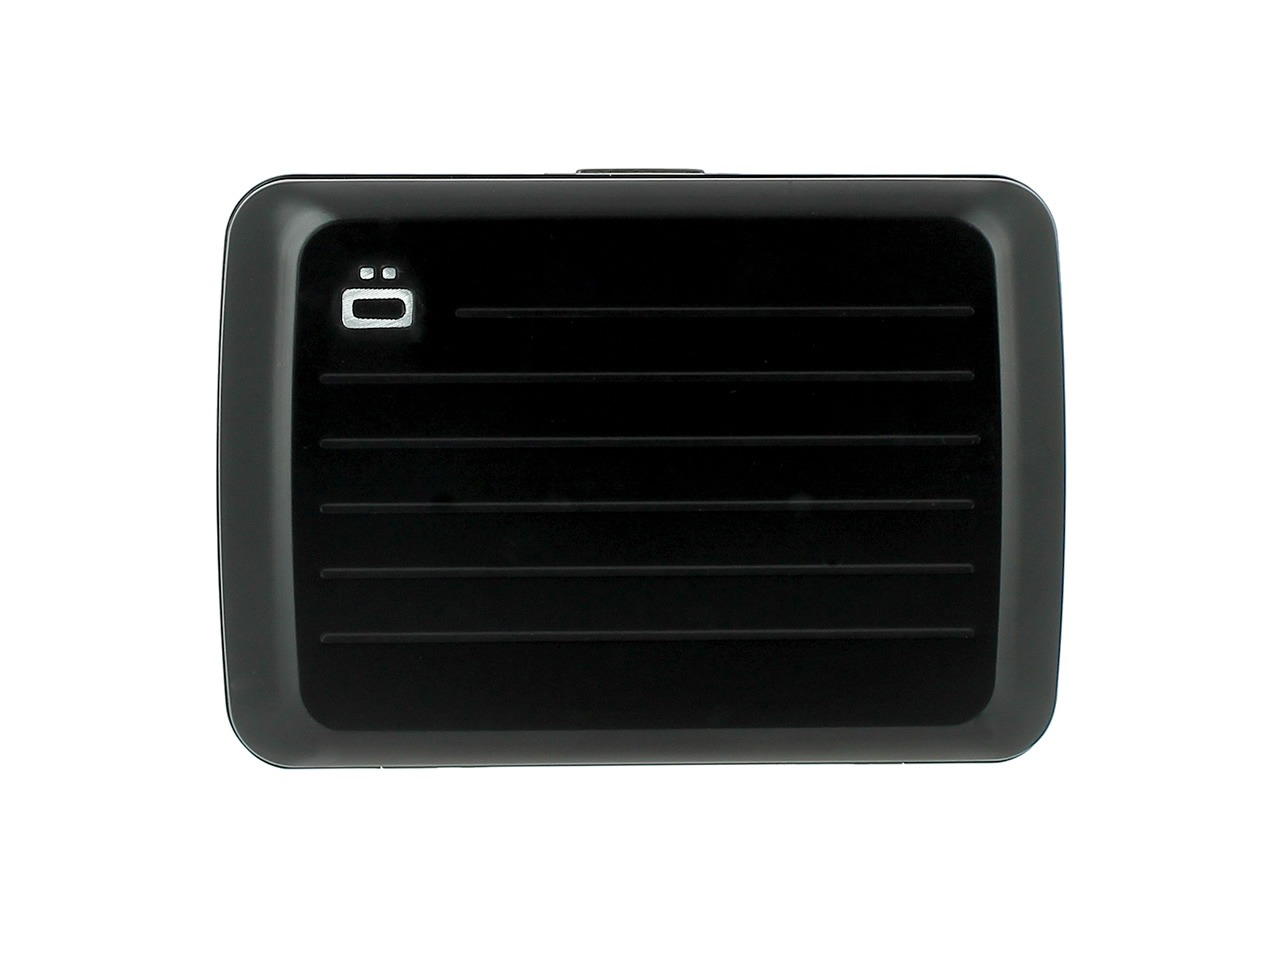 v-2-0-card-case-black-147-1384-0x0.jpg